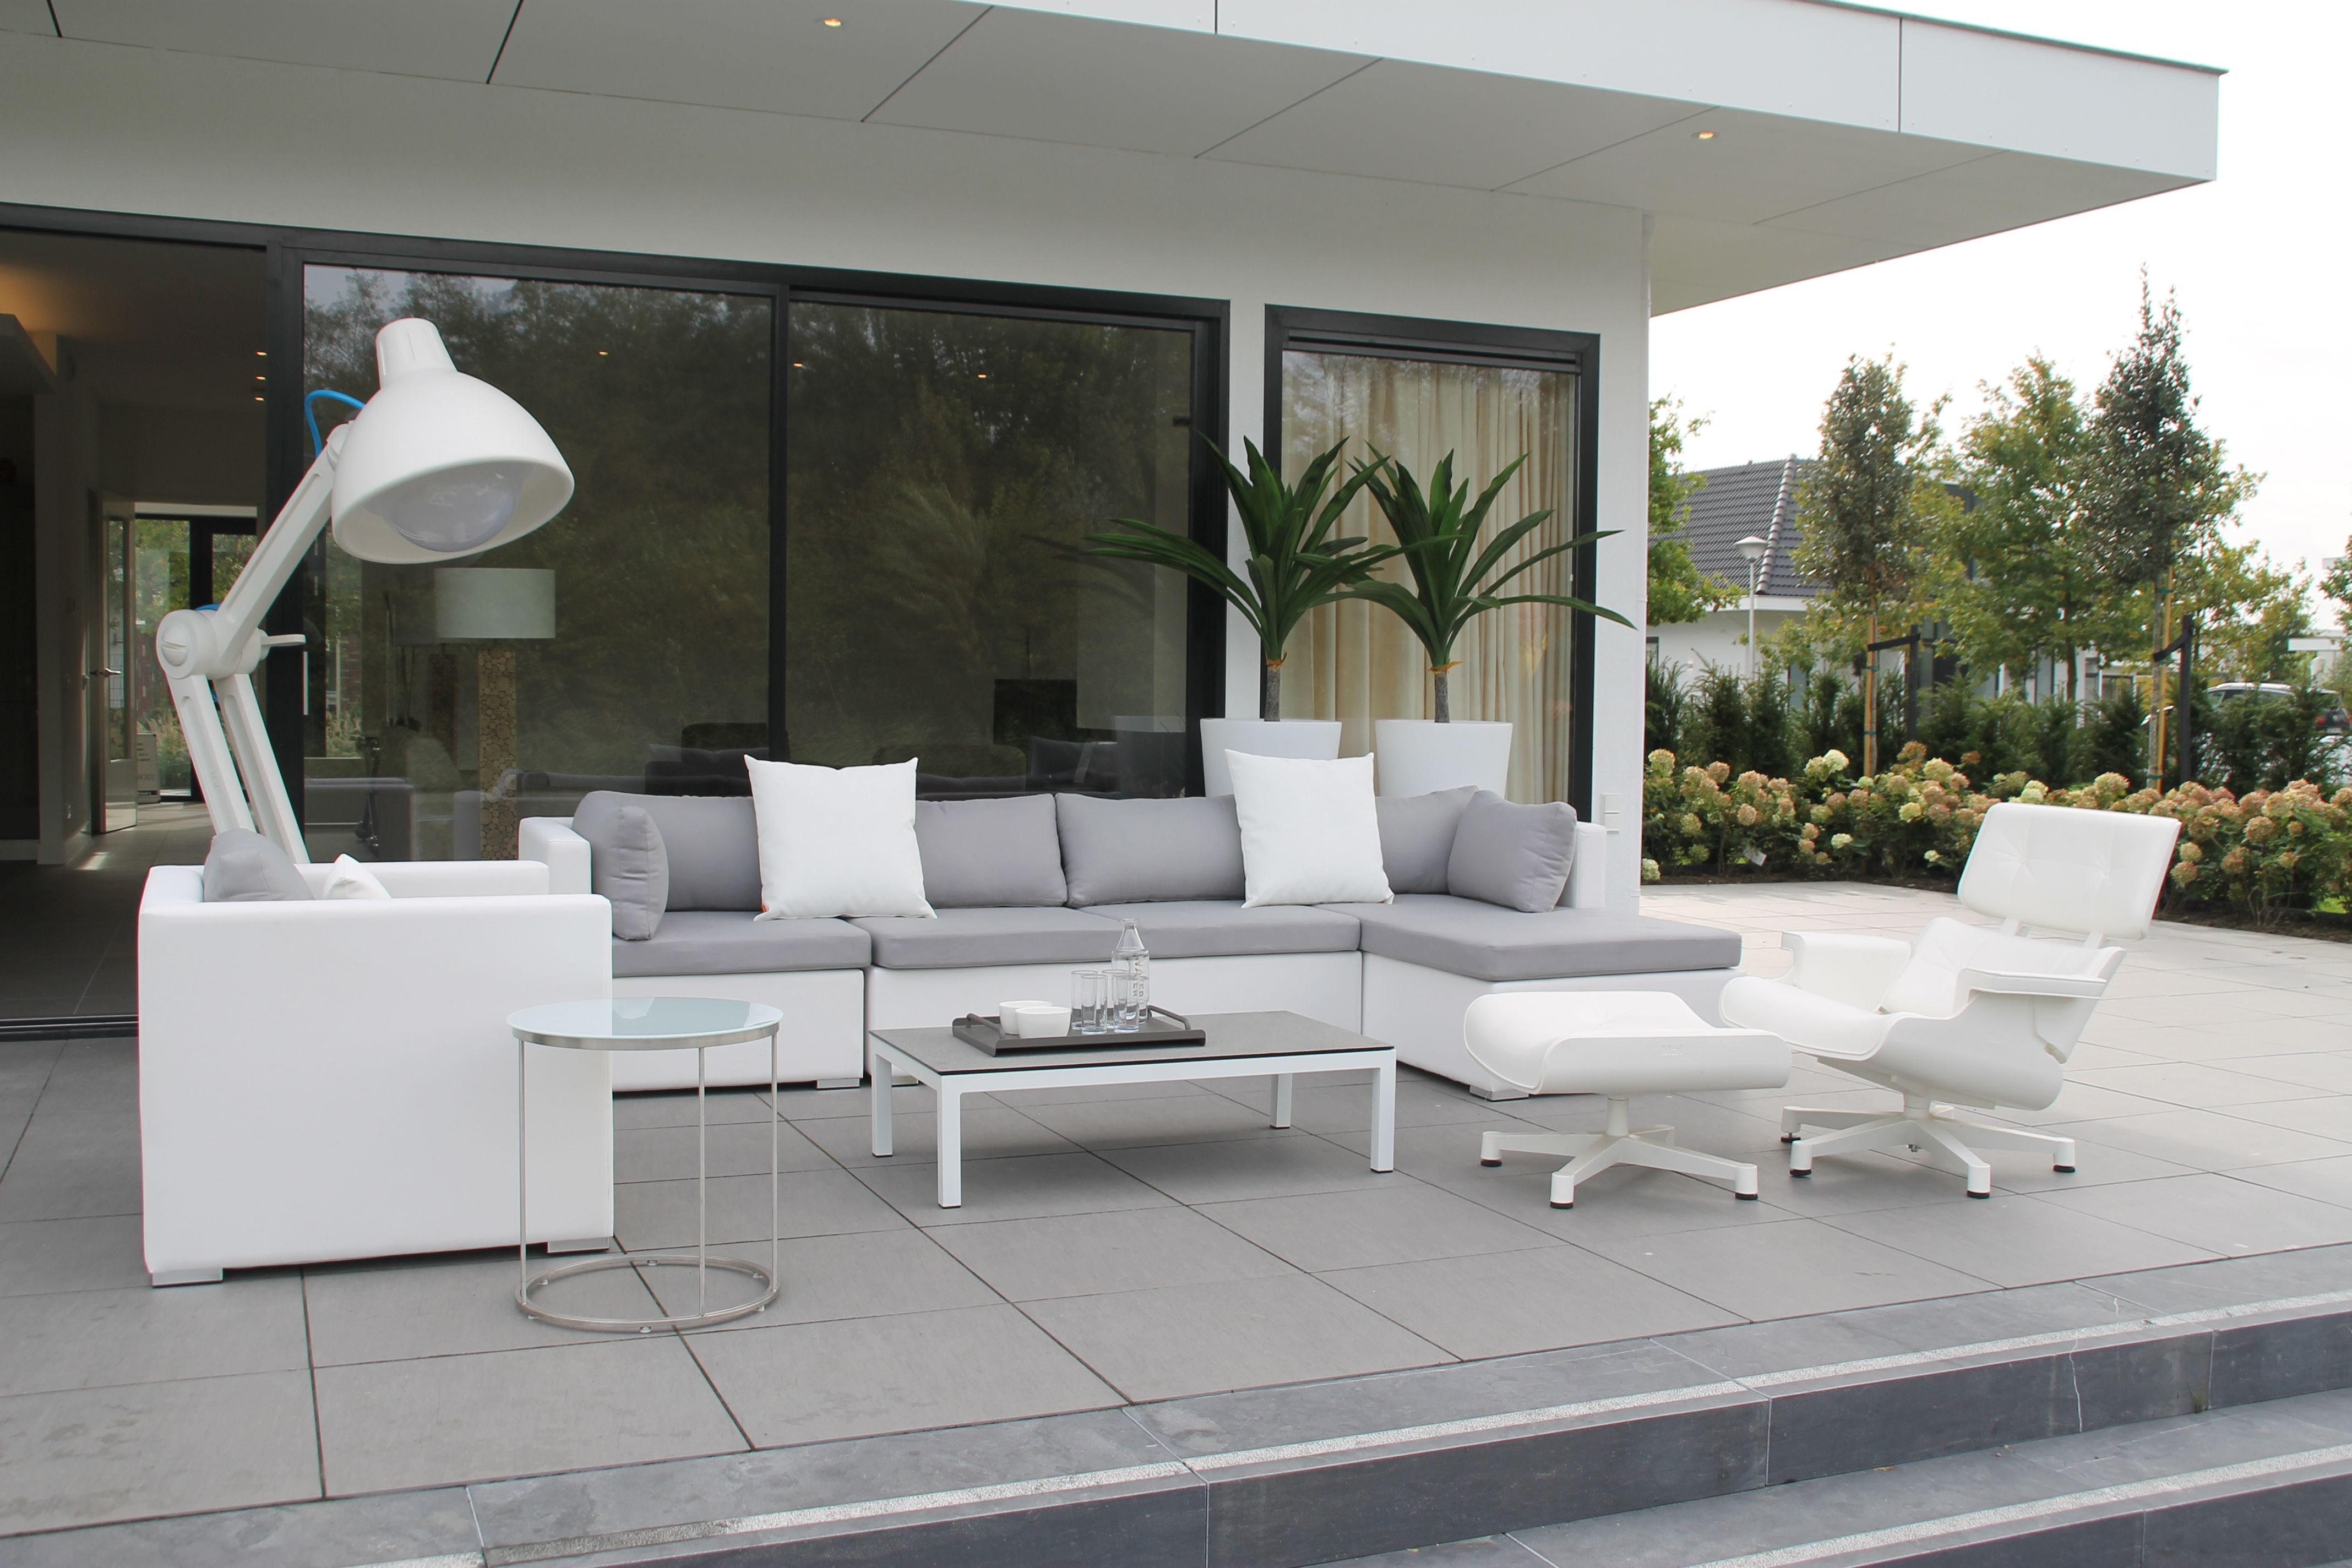 Tuinset tuinmeubelen lounge loungeset white grey for Intratuin tuinstoelen